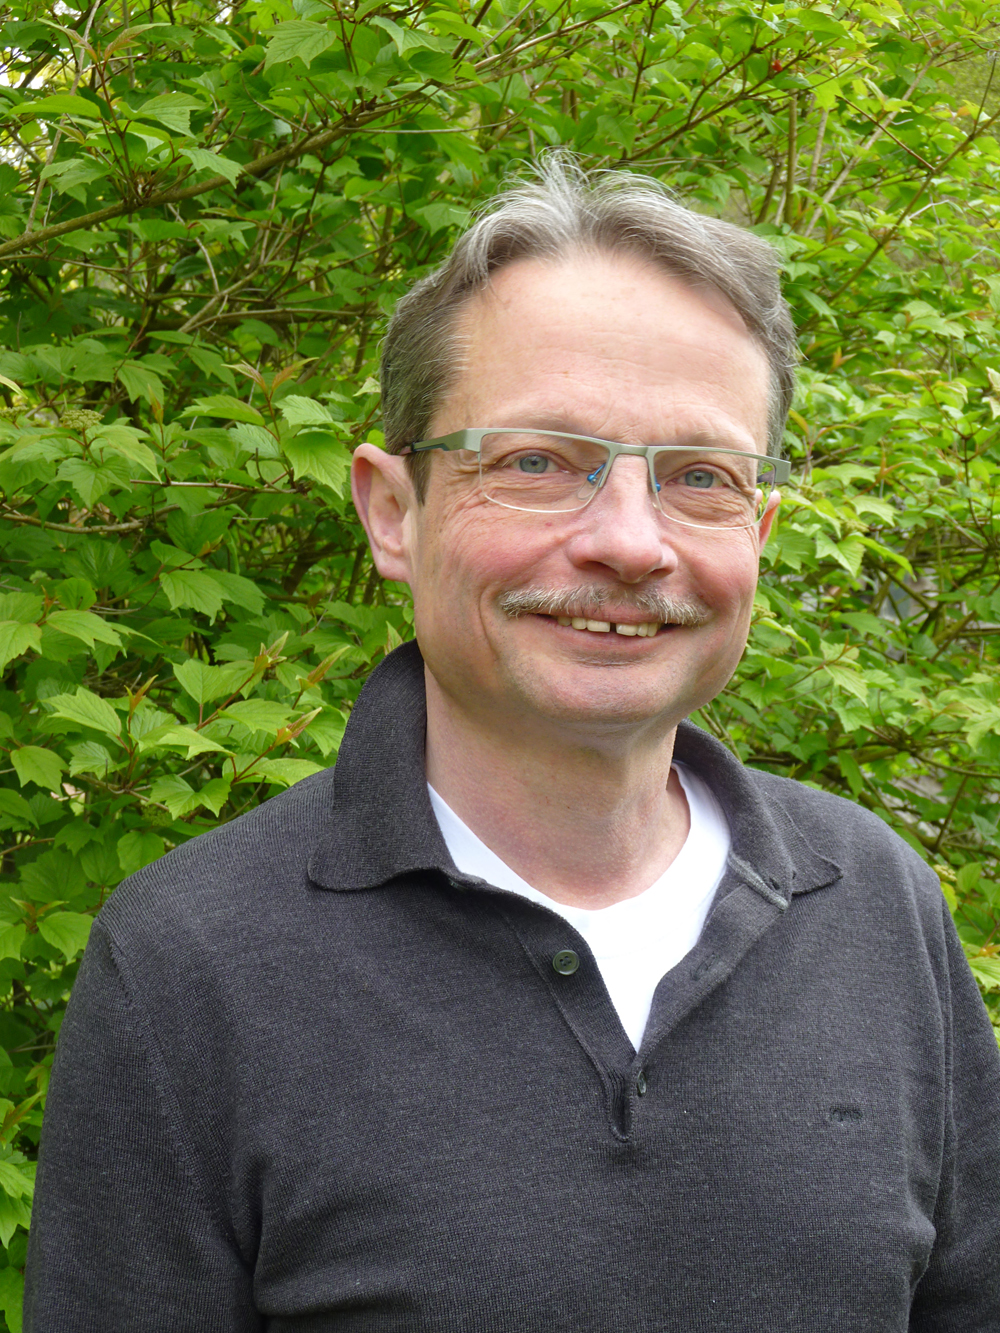 Thomas Braden, Gestalttherapeut aus Darmstadt